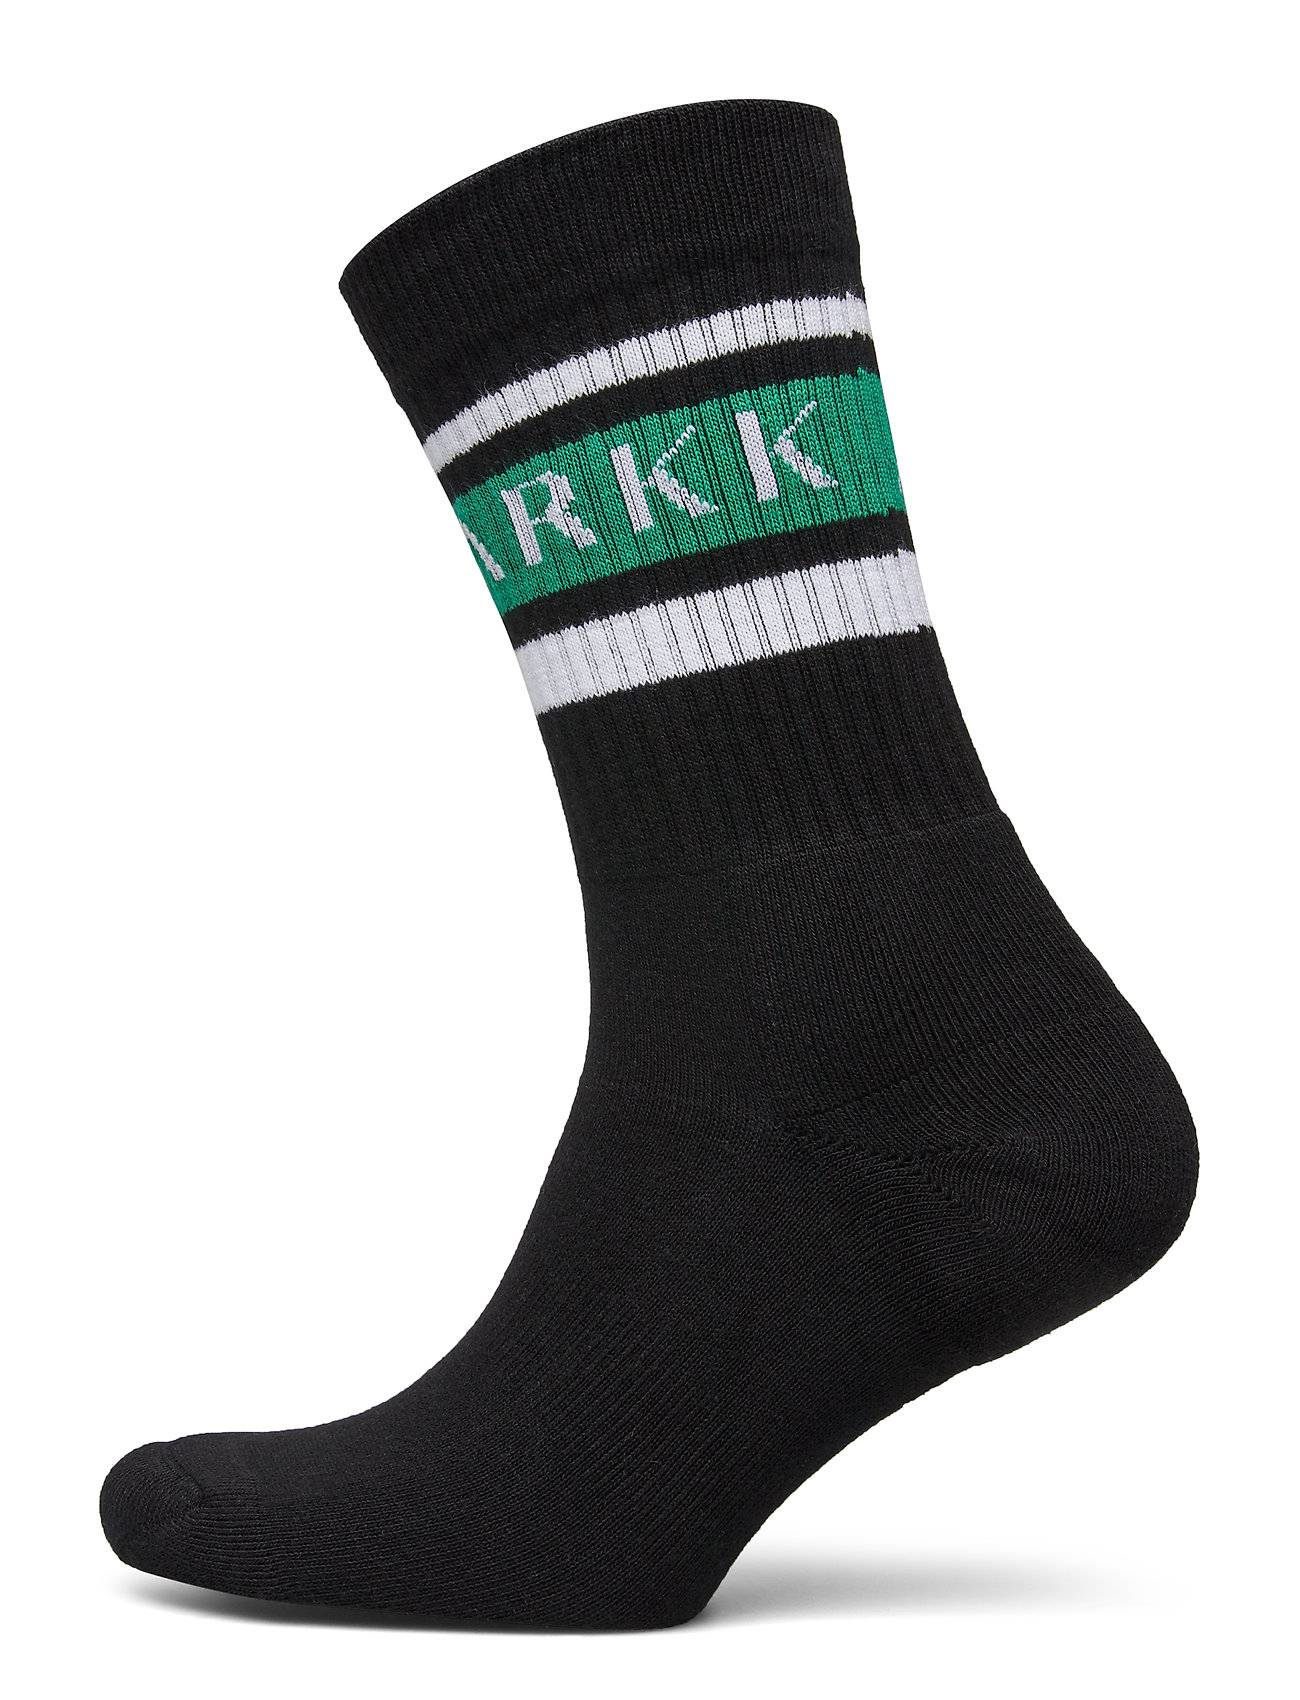 ARKK Copenhagen The High Sock - Striped Black Soft Underwear Socks Regular Socks Musta ARKK Copenhagen